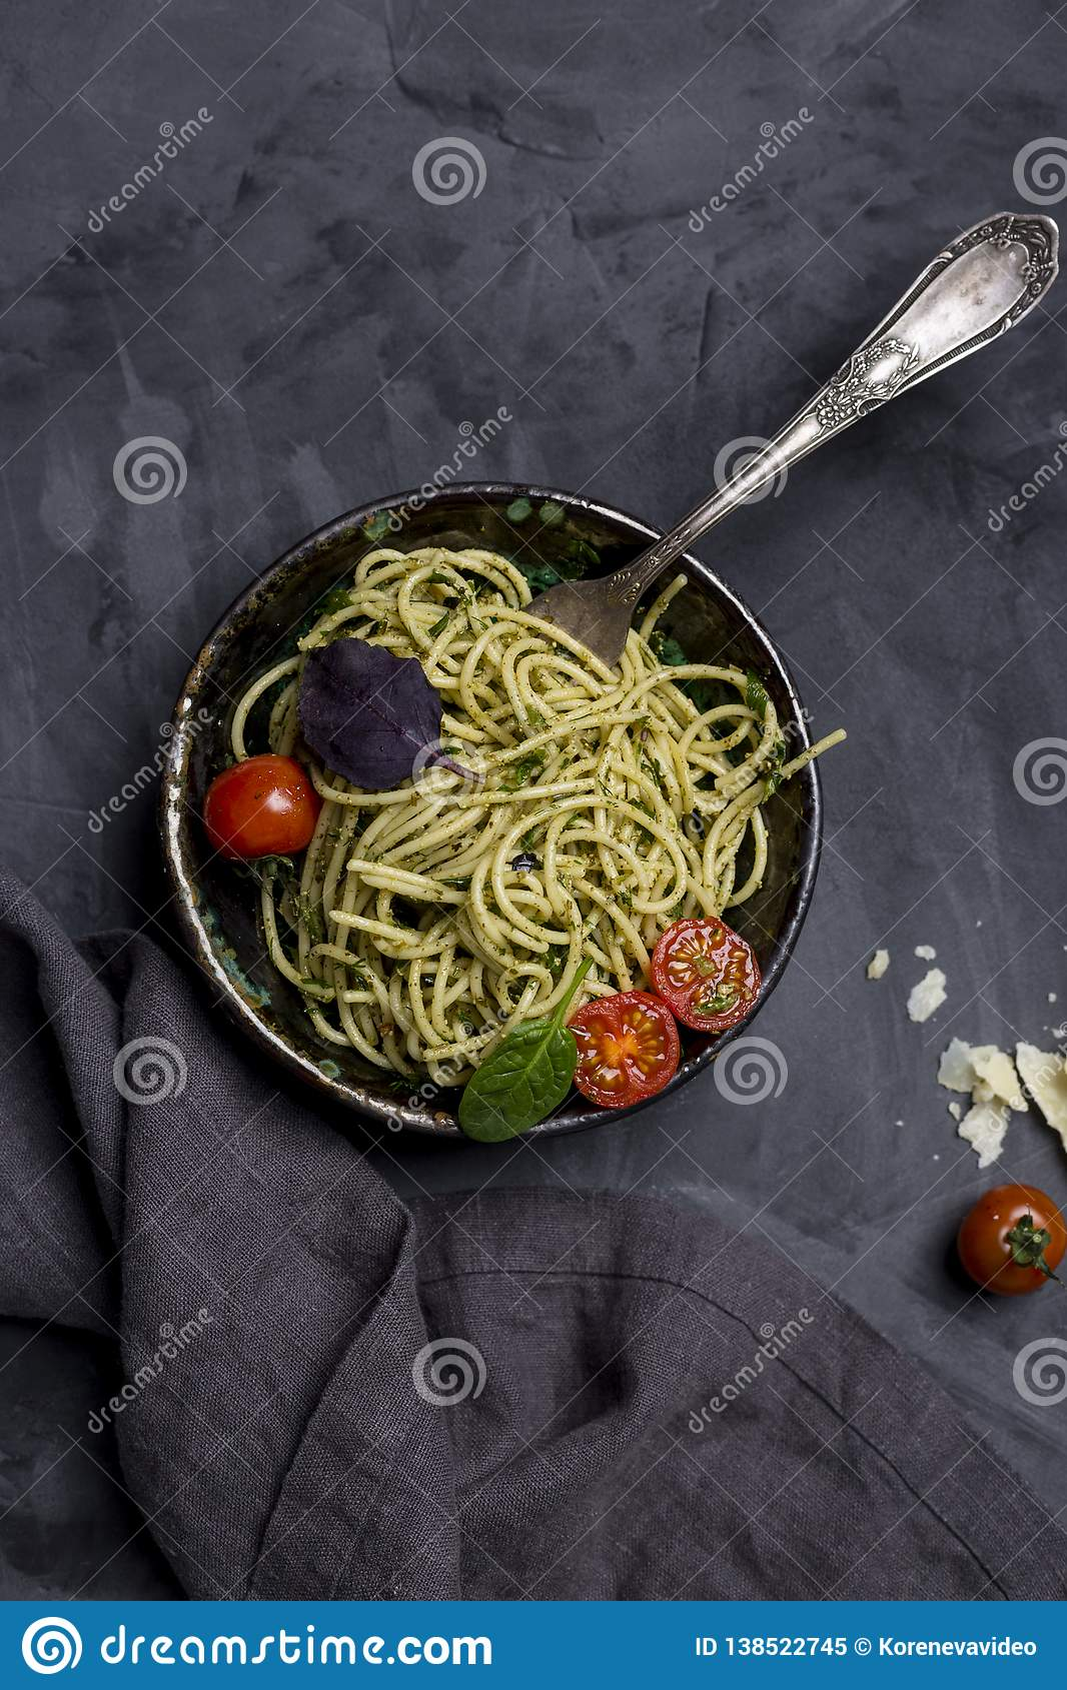 Pasta with pesto in bowl at dark background